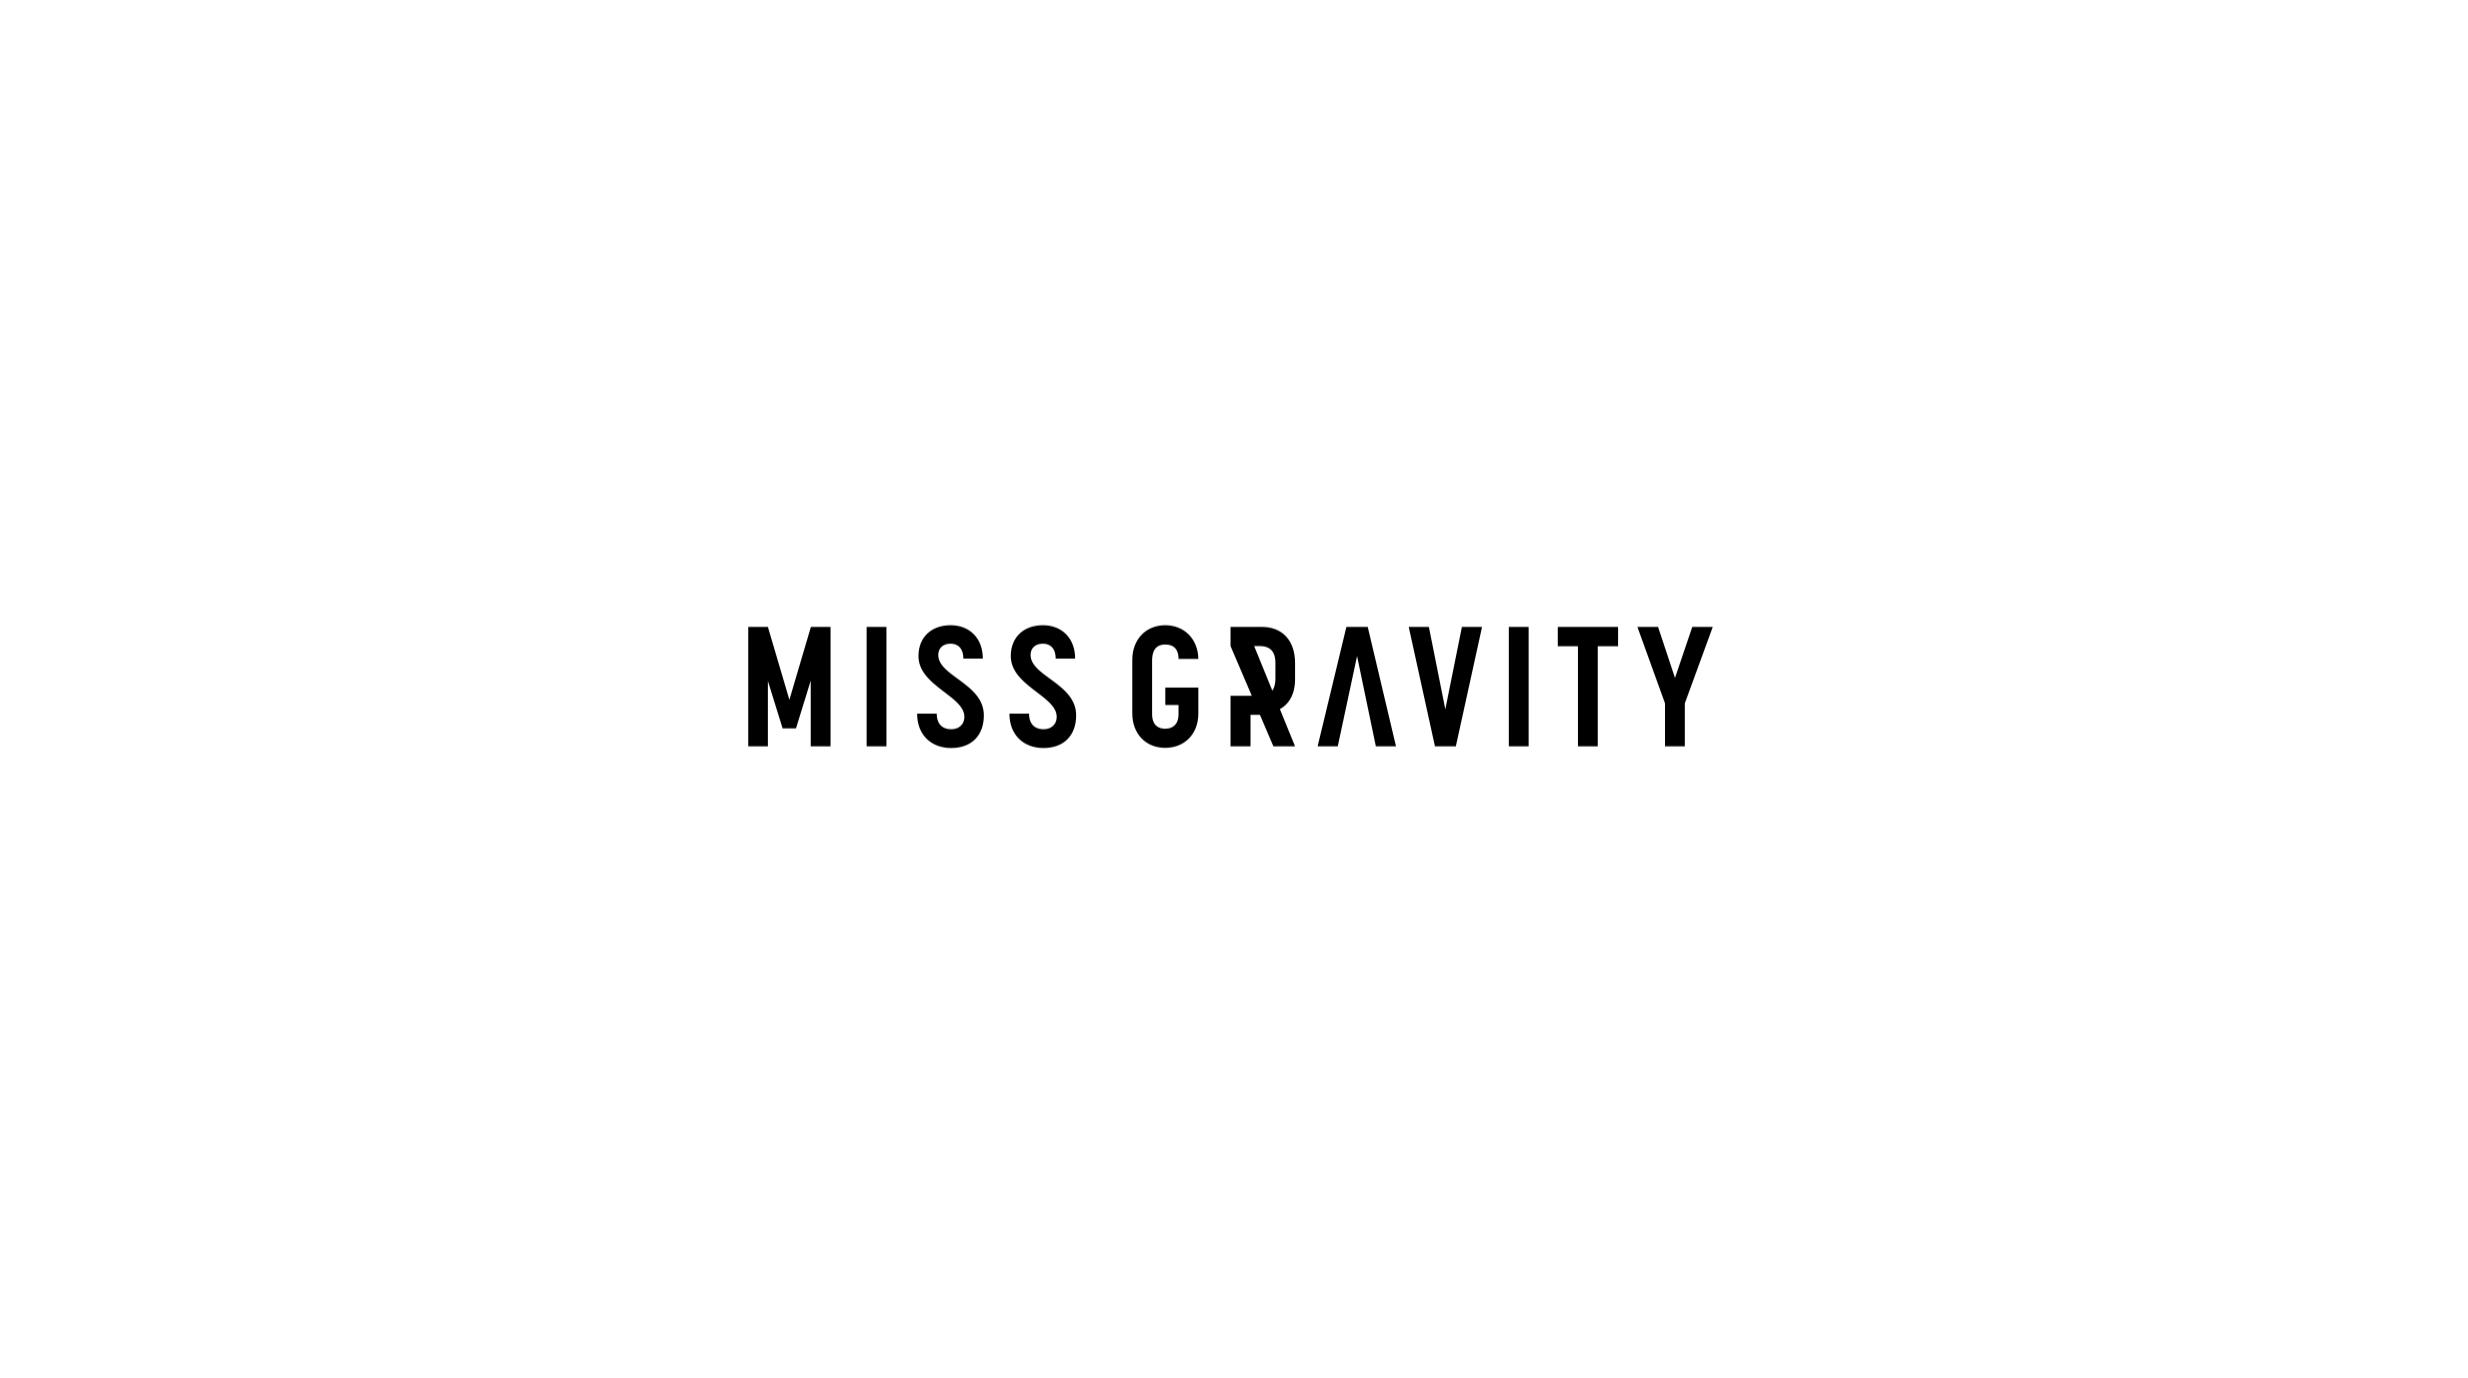 Miss Gravity